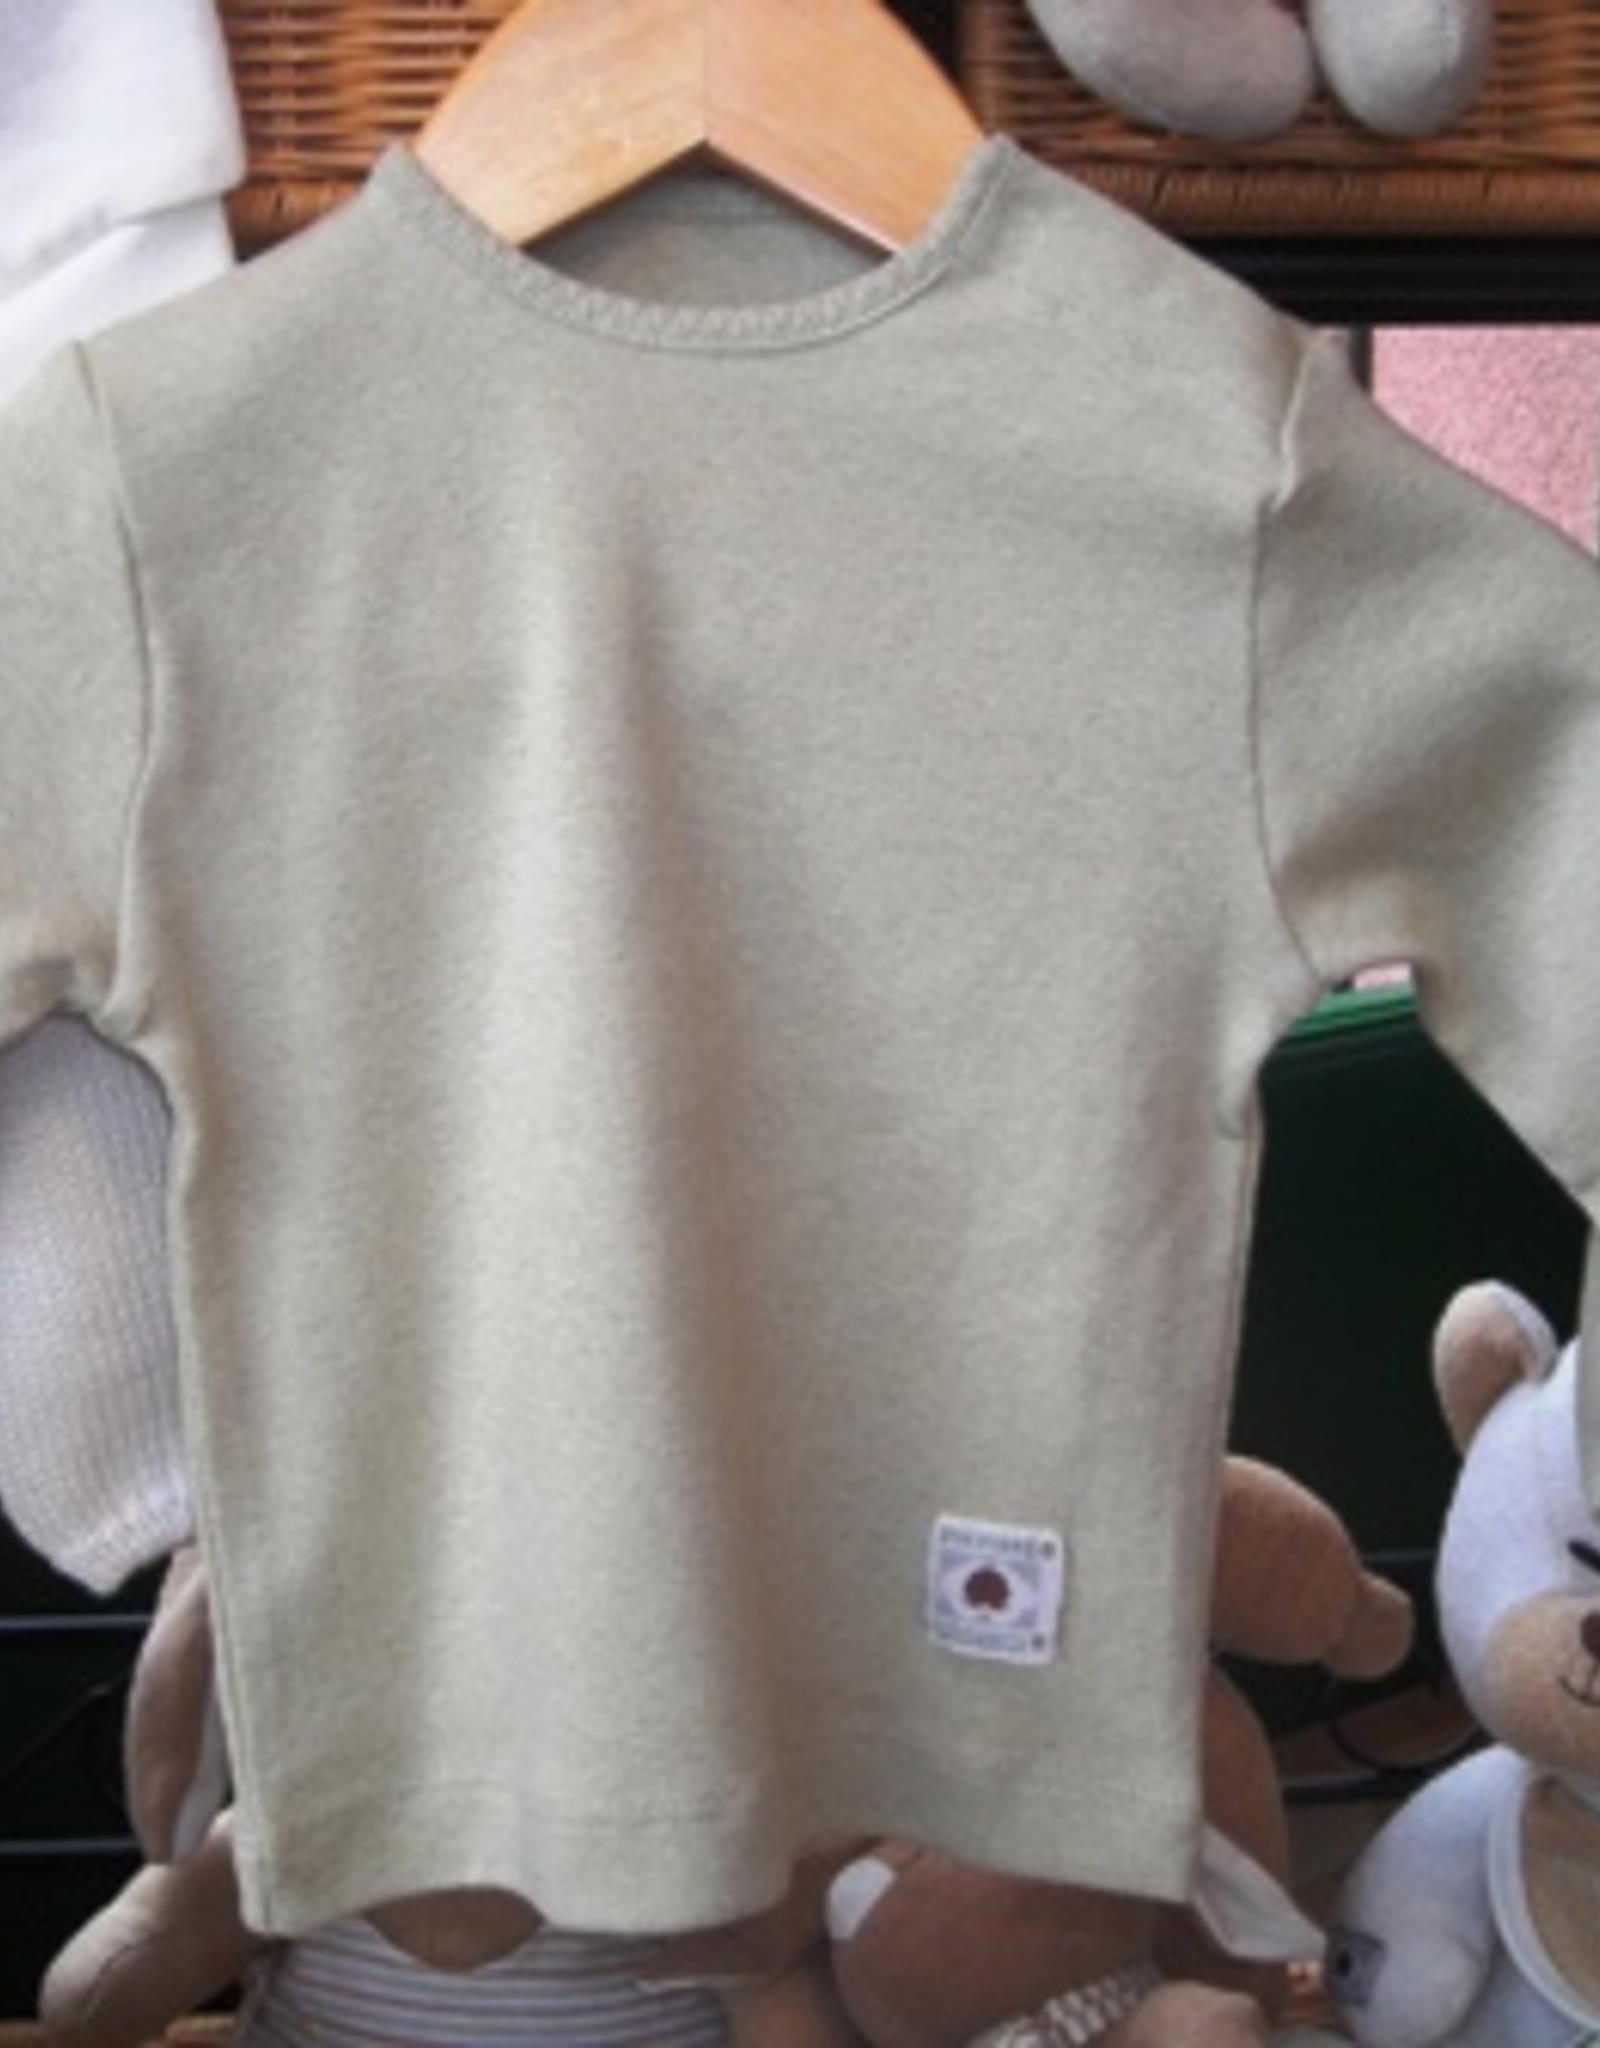 Baby t shirt zig zag sizes 12, 18 months.